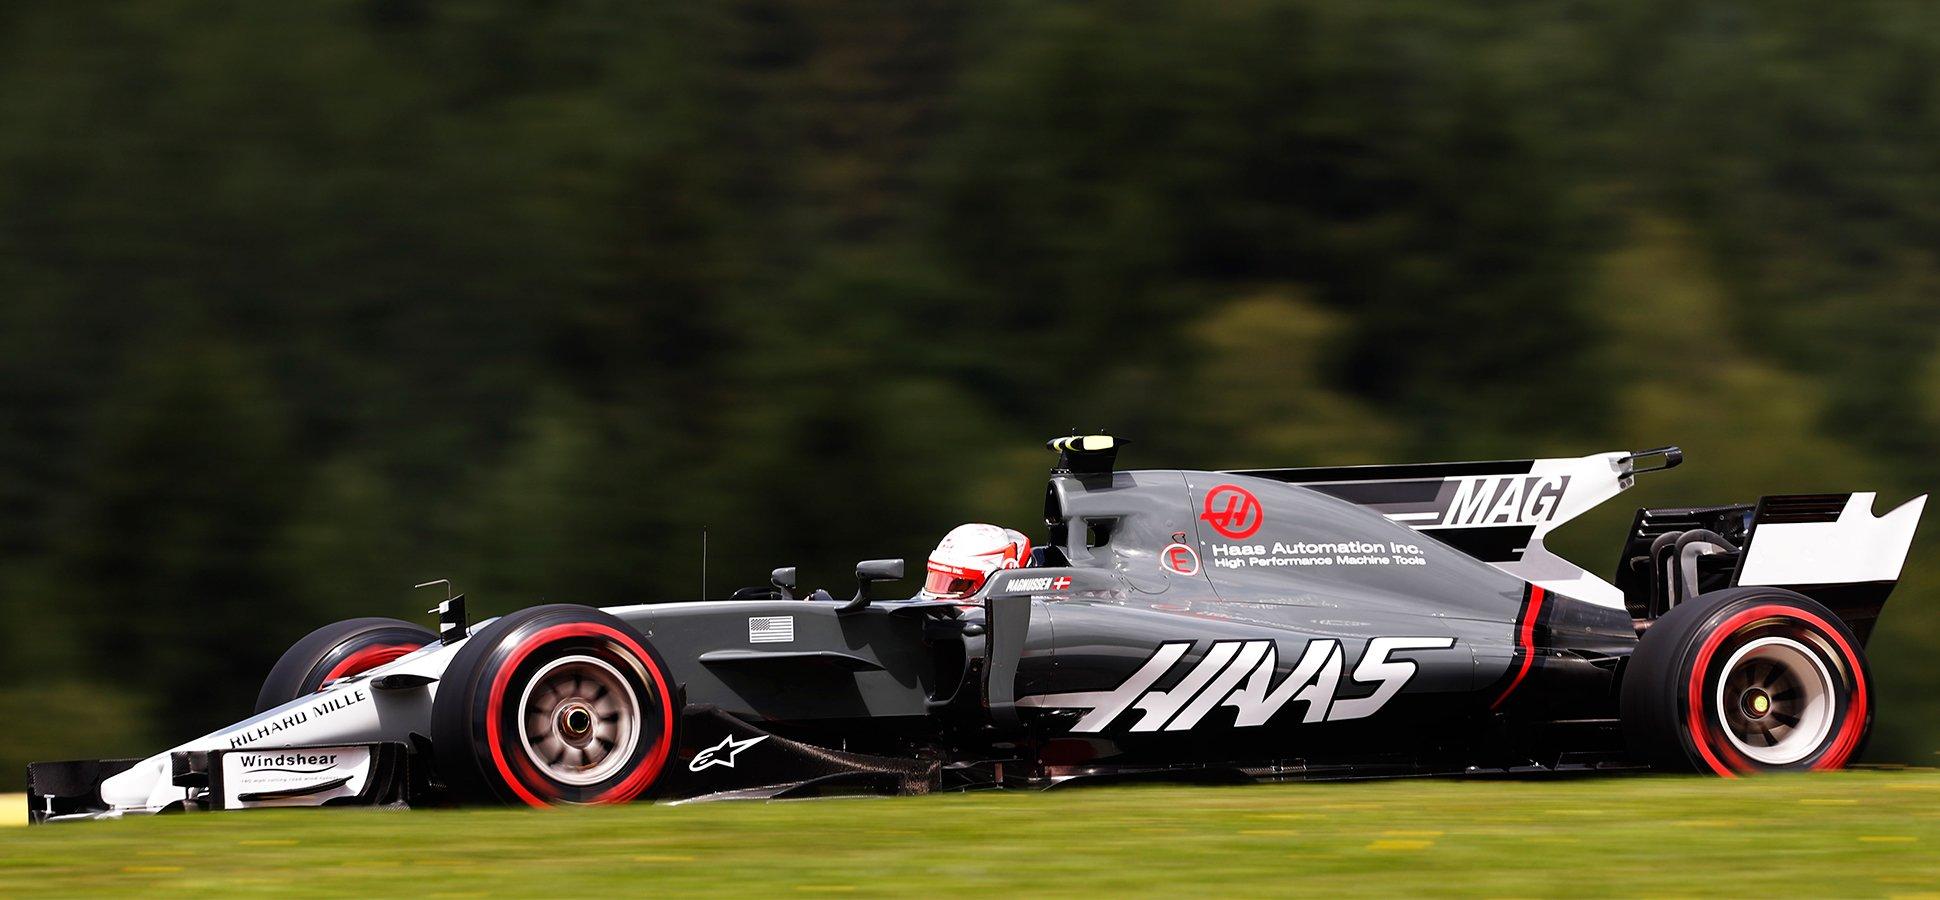 Inside the World's Fastest Startup: Haas F1, America's Formula 1 Racing  Team   Inc.com